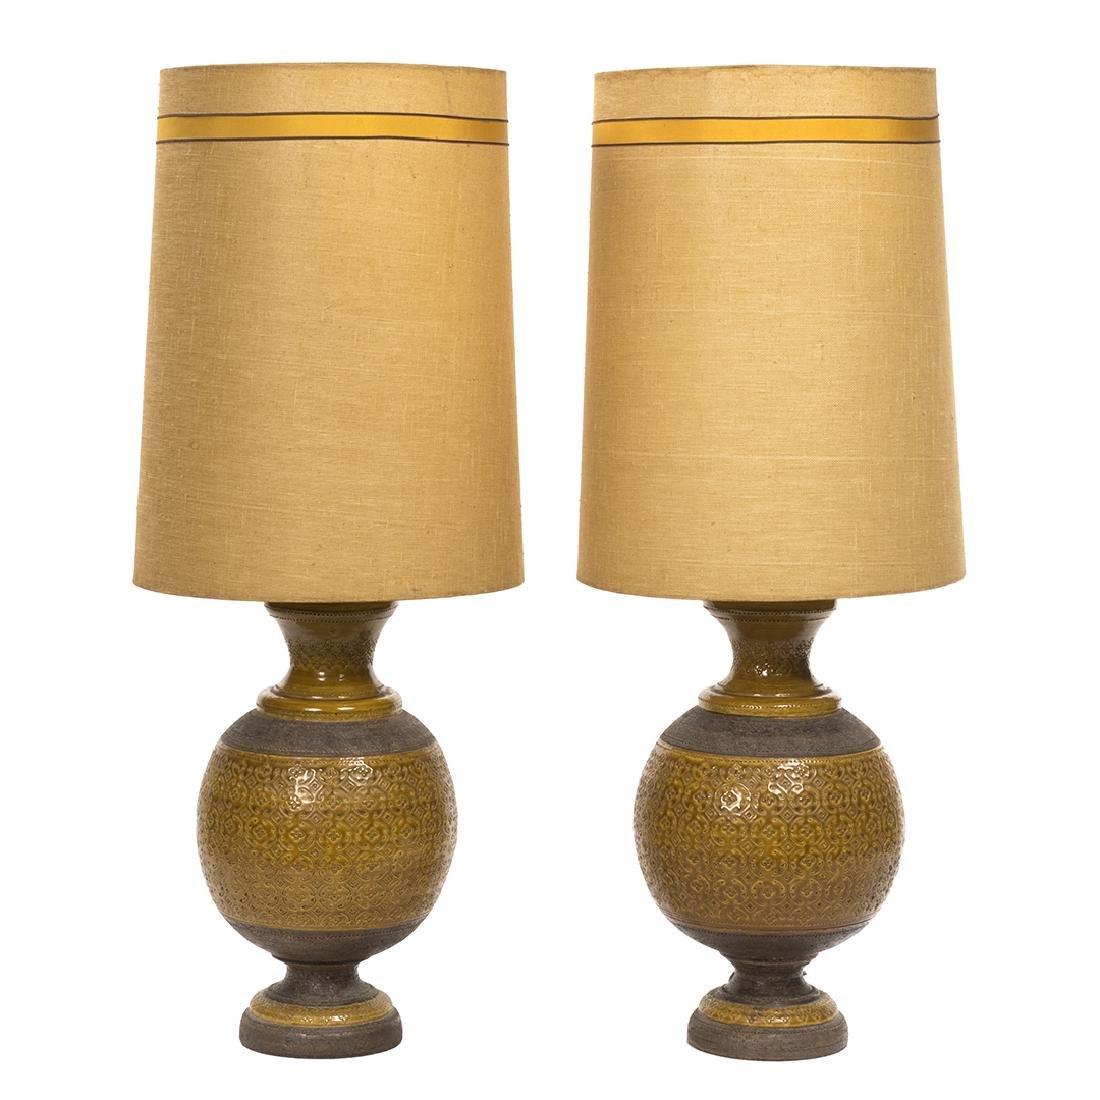 Aldo Londi Bitossi Lamps (2)